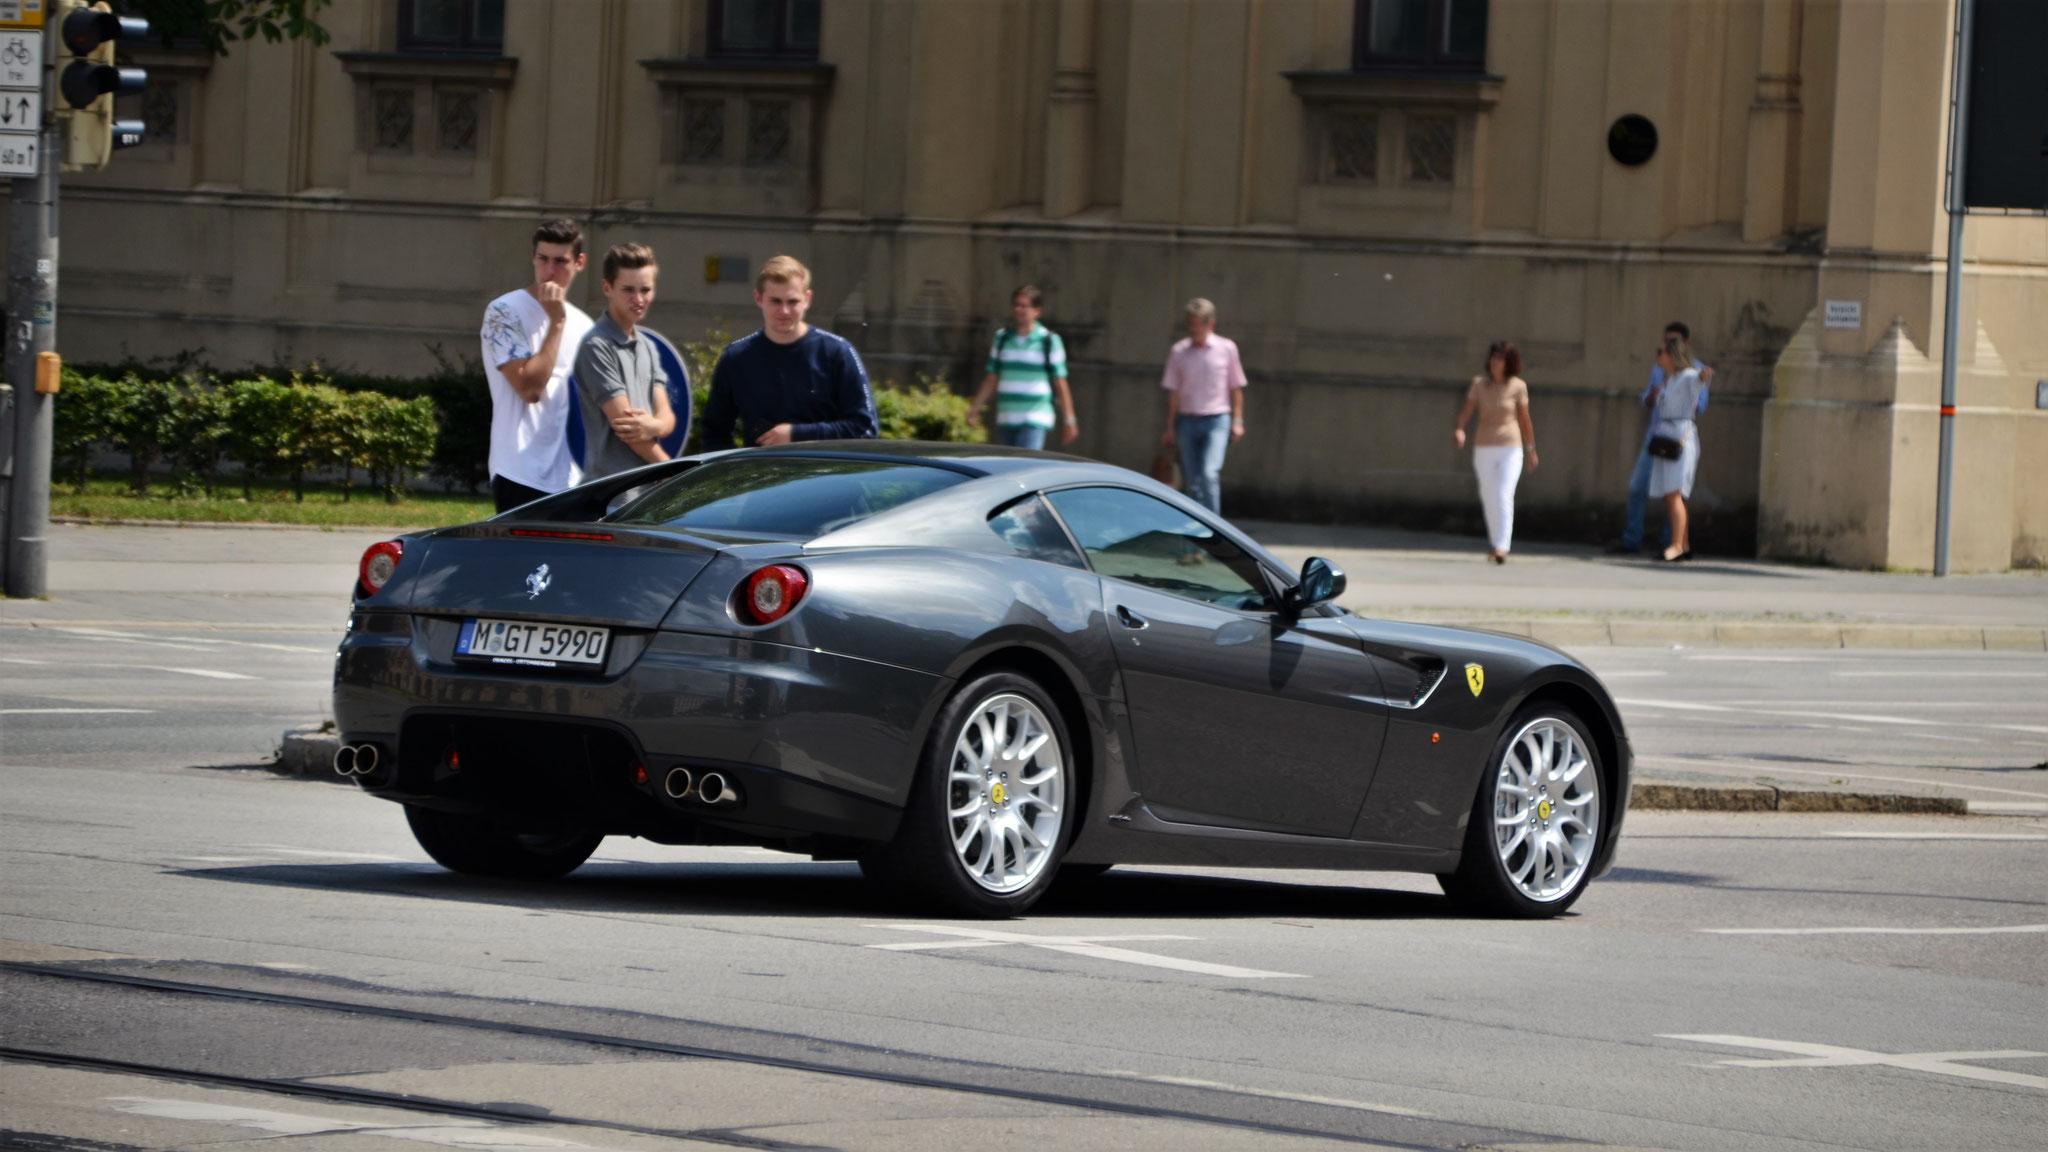 Ferrari 599 GTB - M-GT-5990